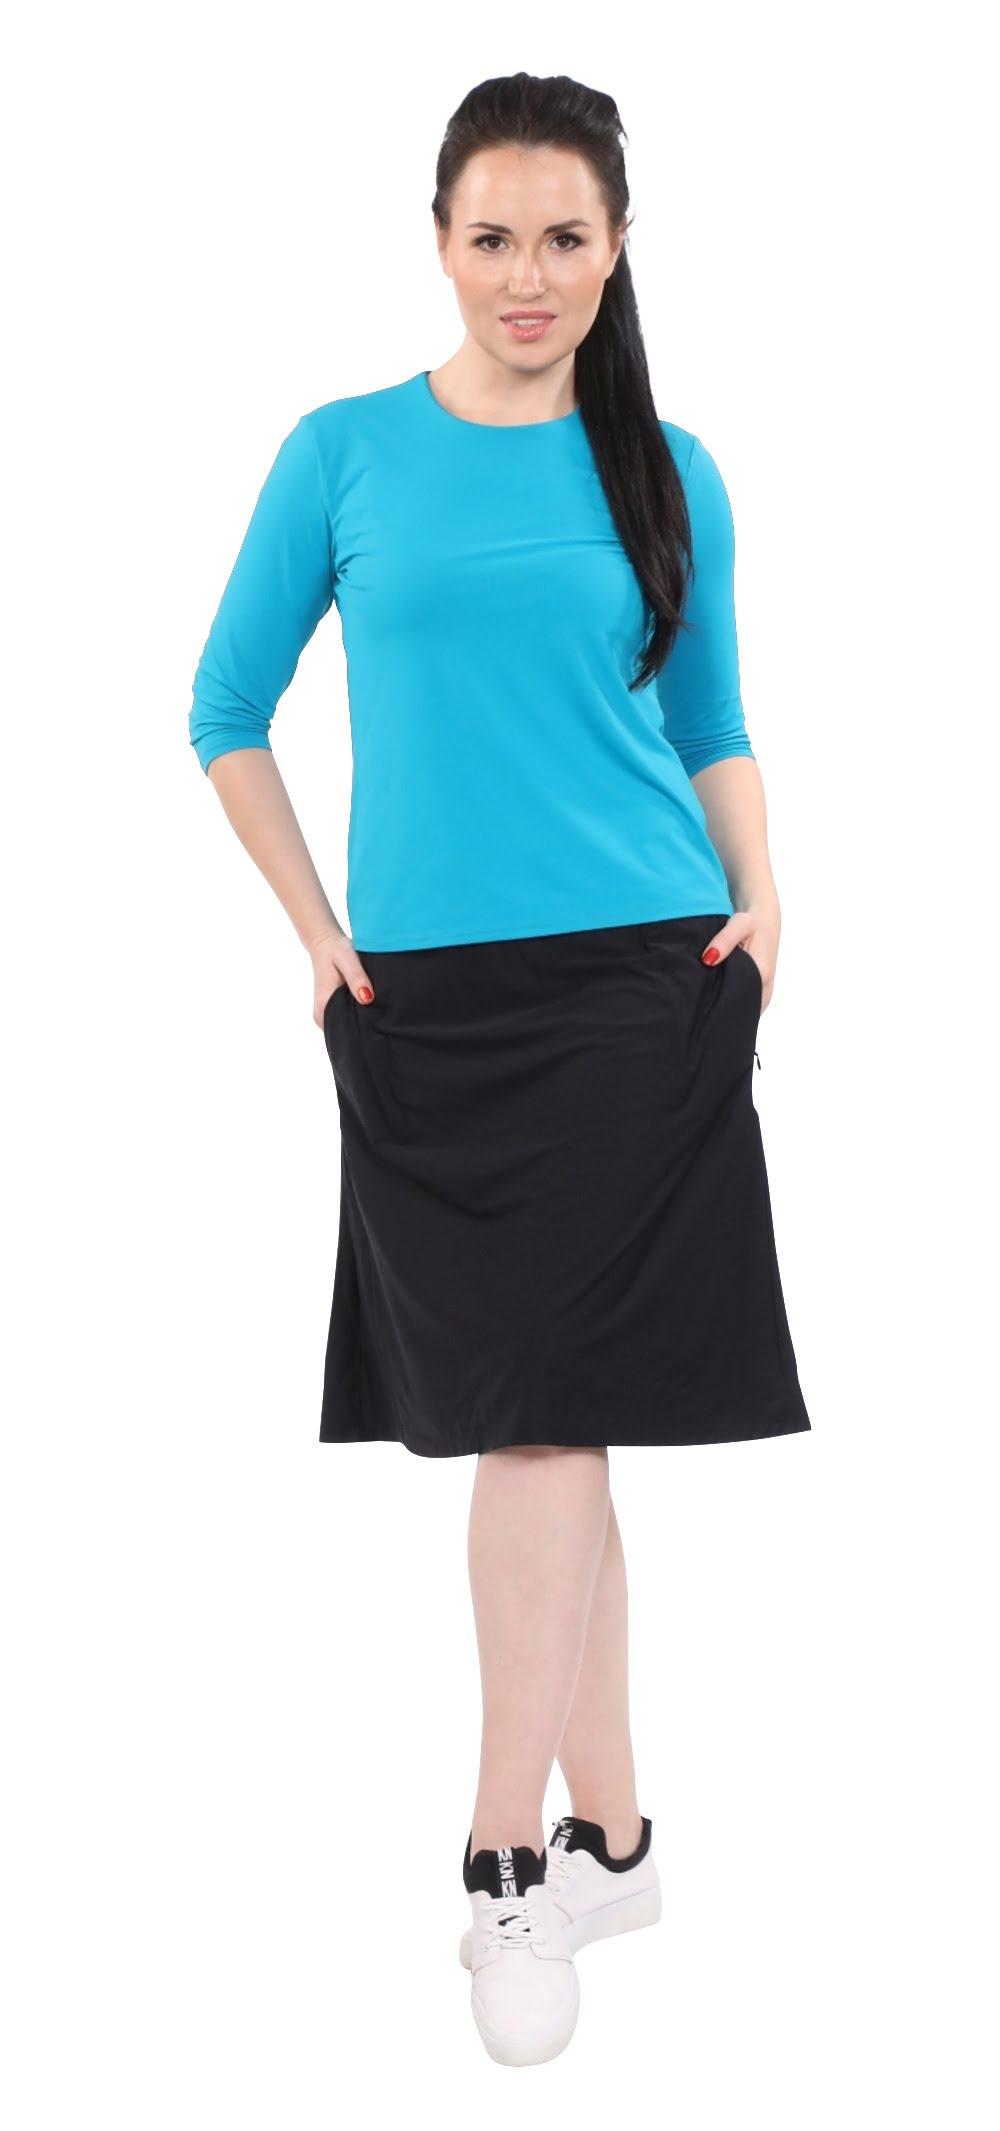 865f13b70c 1442. Skirted Swimwear/ Athletic Skirt ...